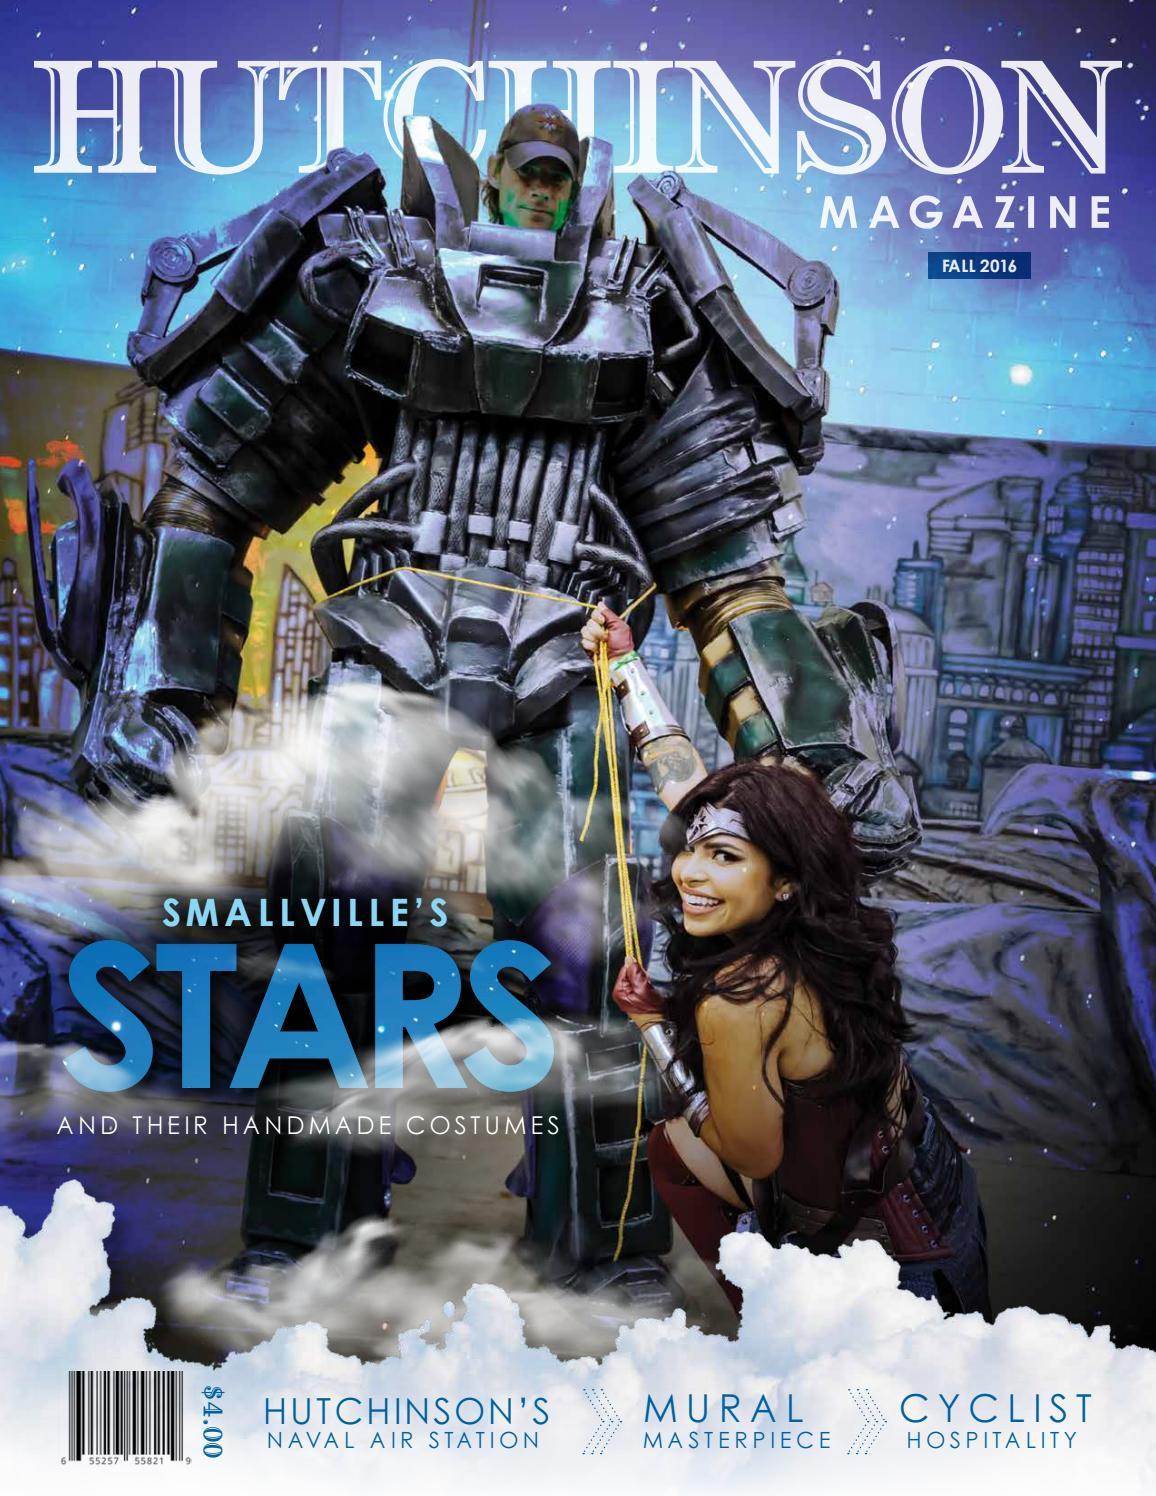 Hutchinson Magazine Fall 2016 By Sunflower Publishing